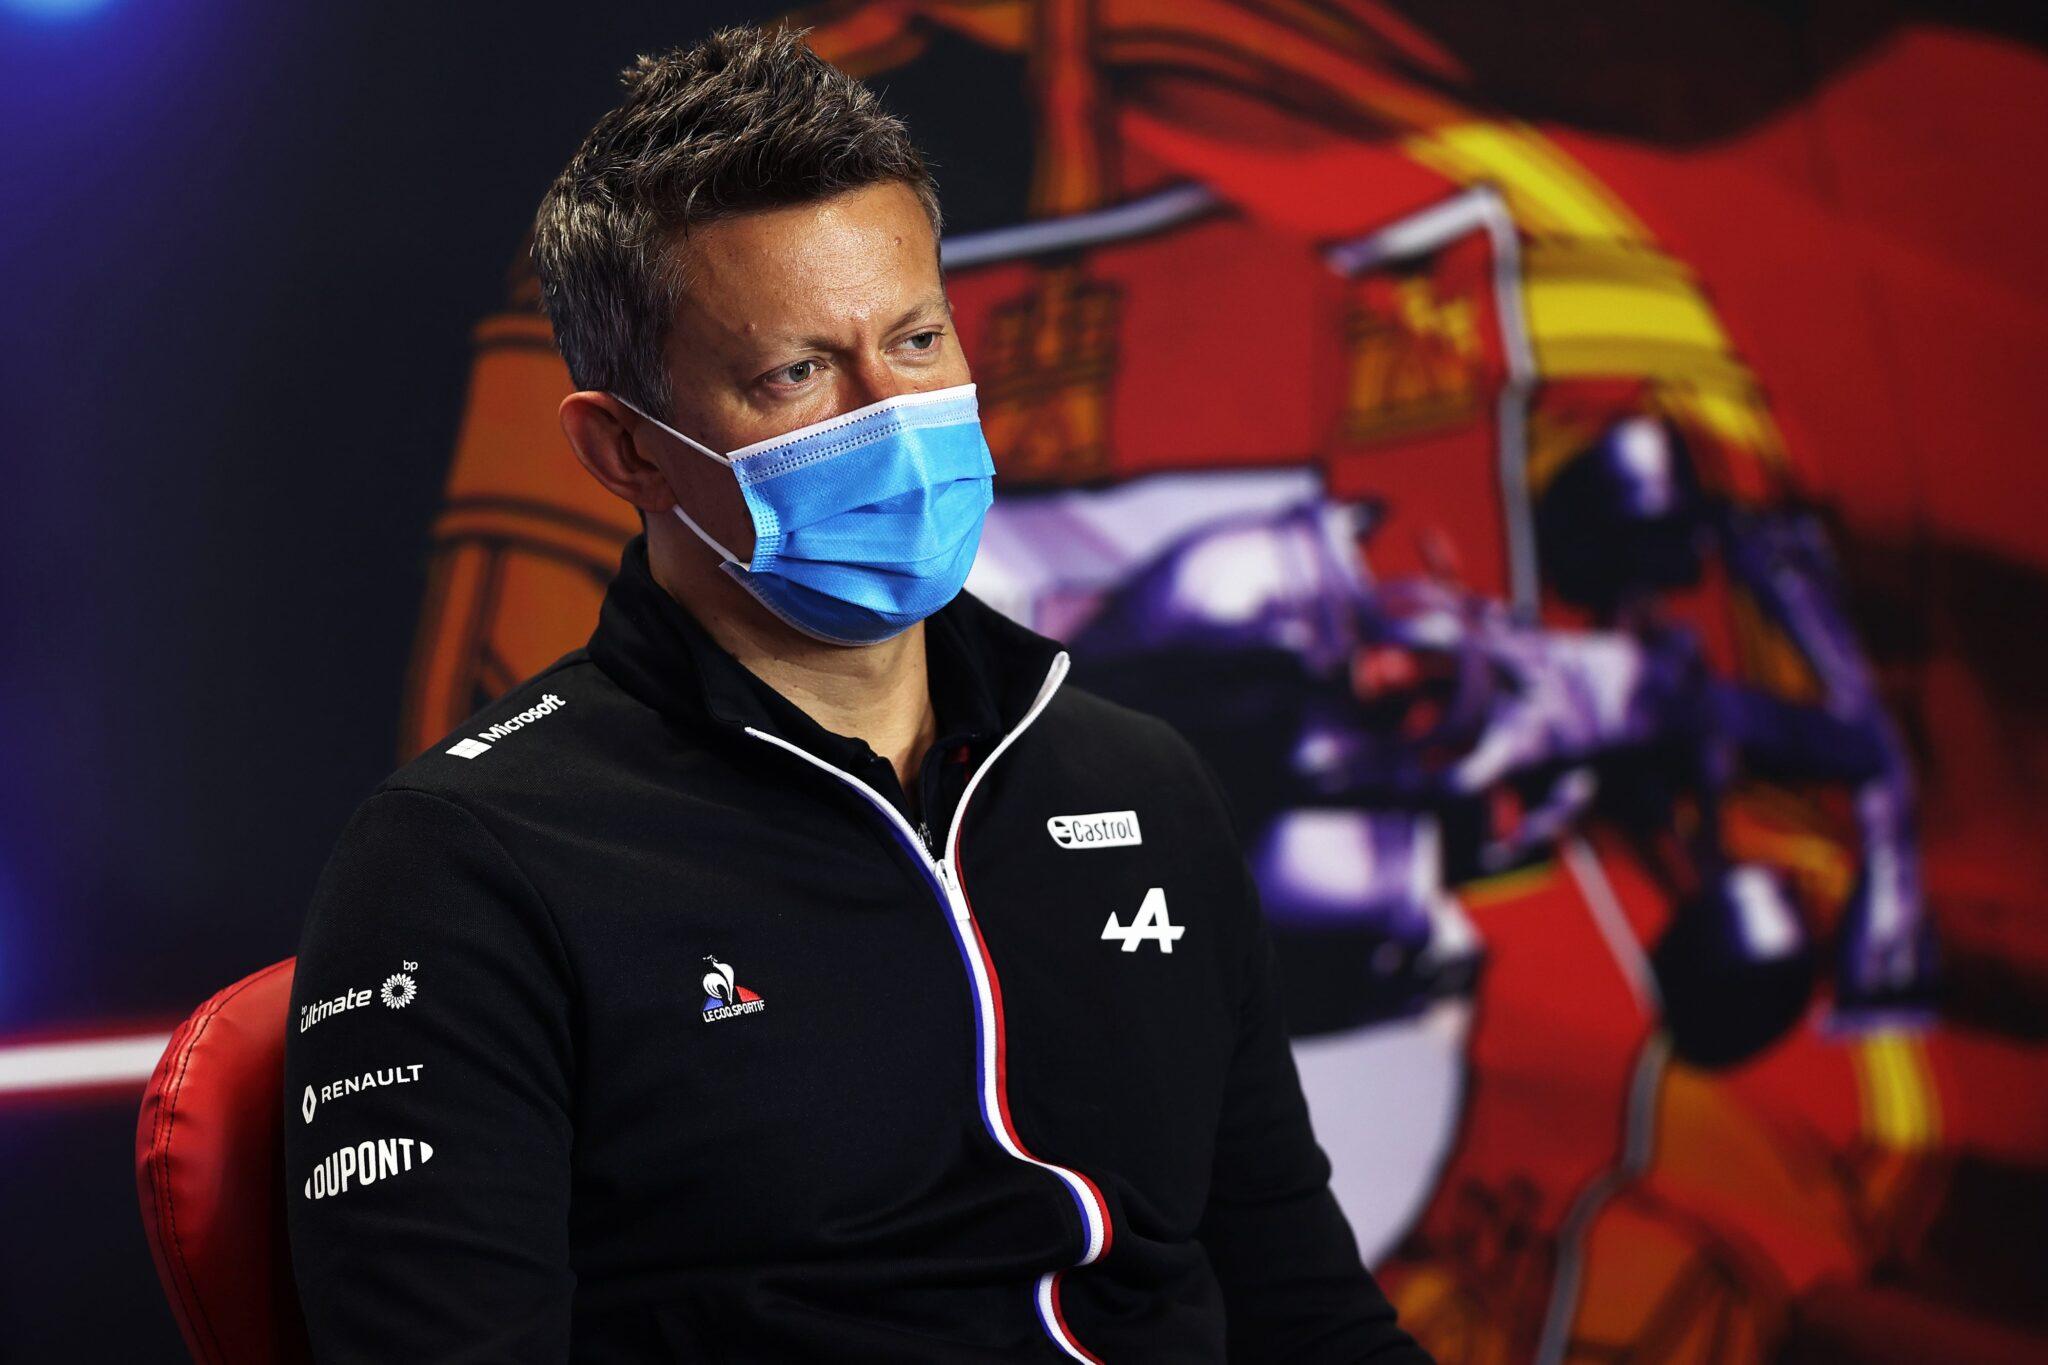 Alpine F1 Team GRAND PRIX HEINEKEN DU PORTUGAL Alonso Ocon 2021 A521 15 | Alpine F1 : Un Grand-Prix de Monaco attendu de pied ferme